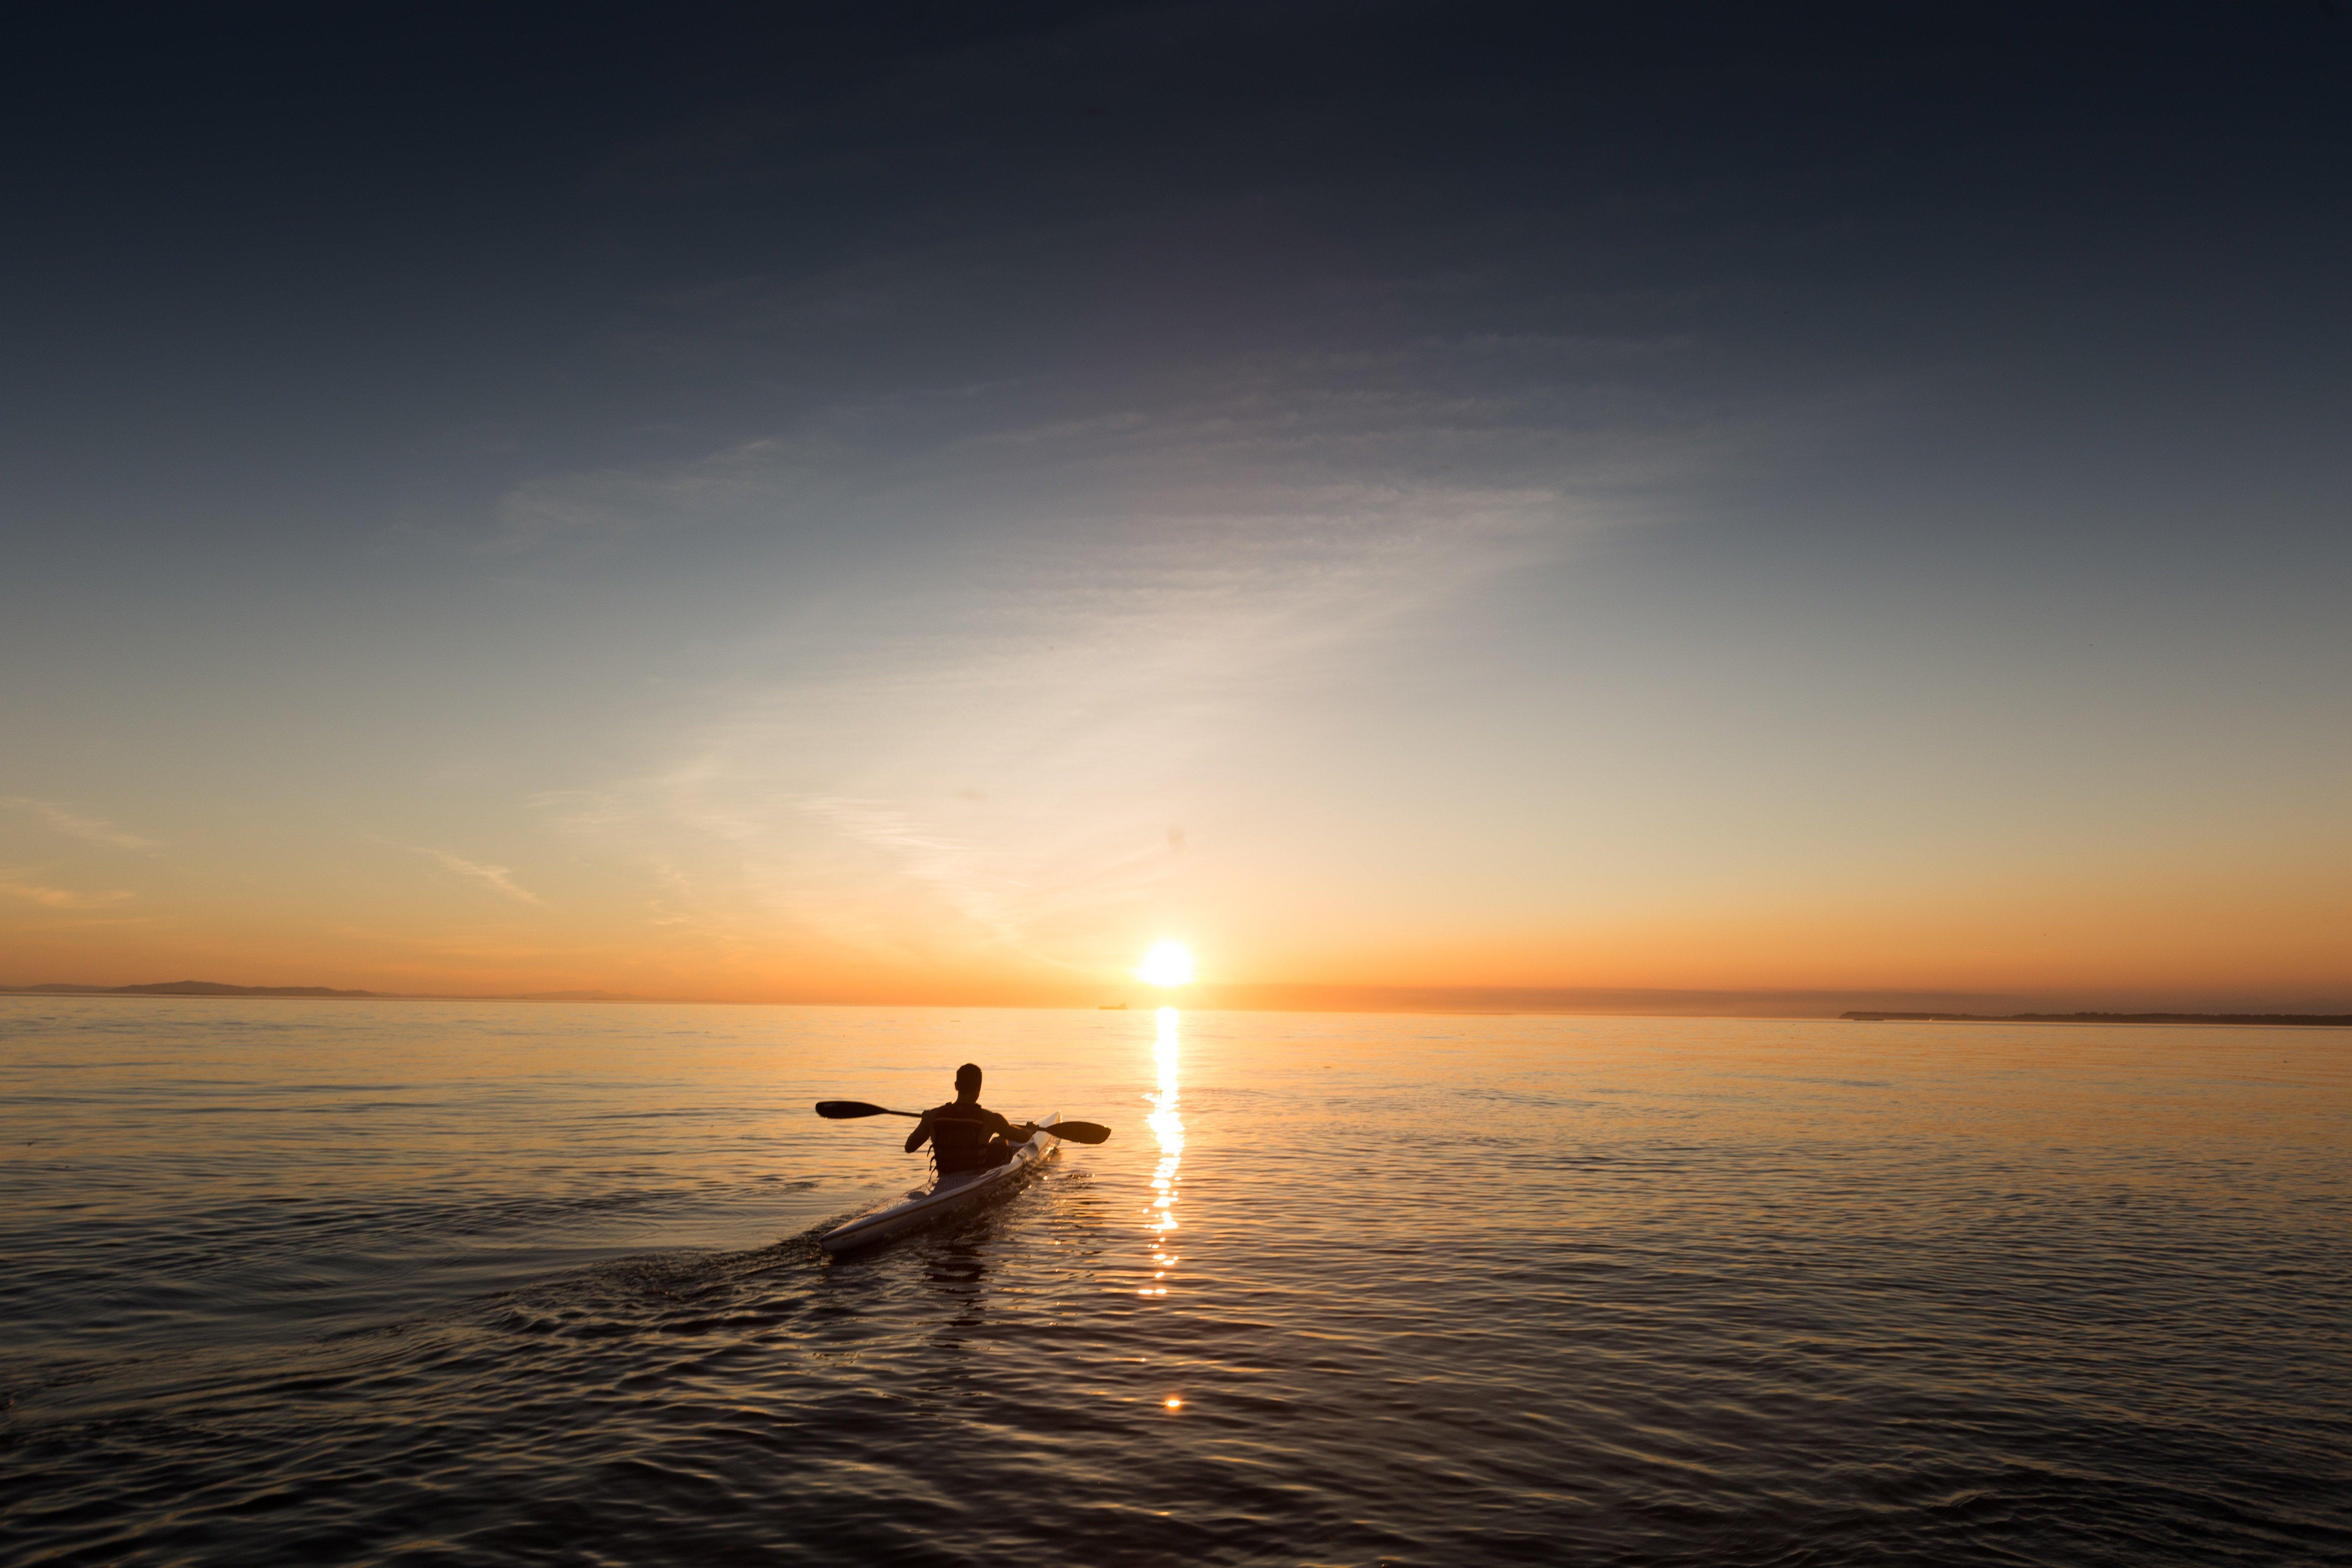 guy-paddle-boarding.jpg